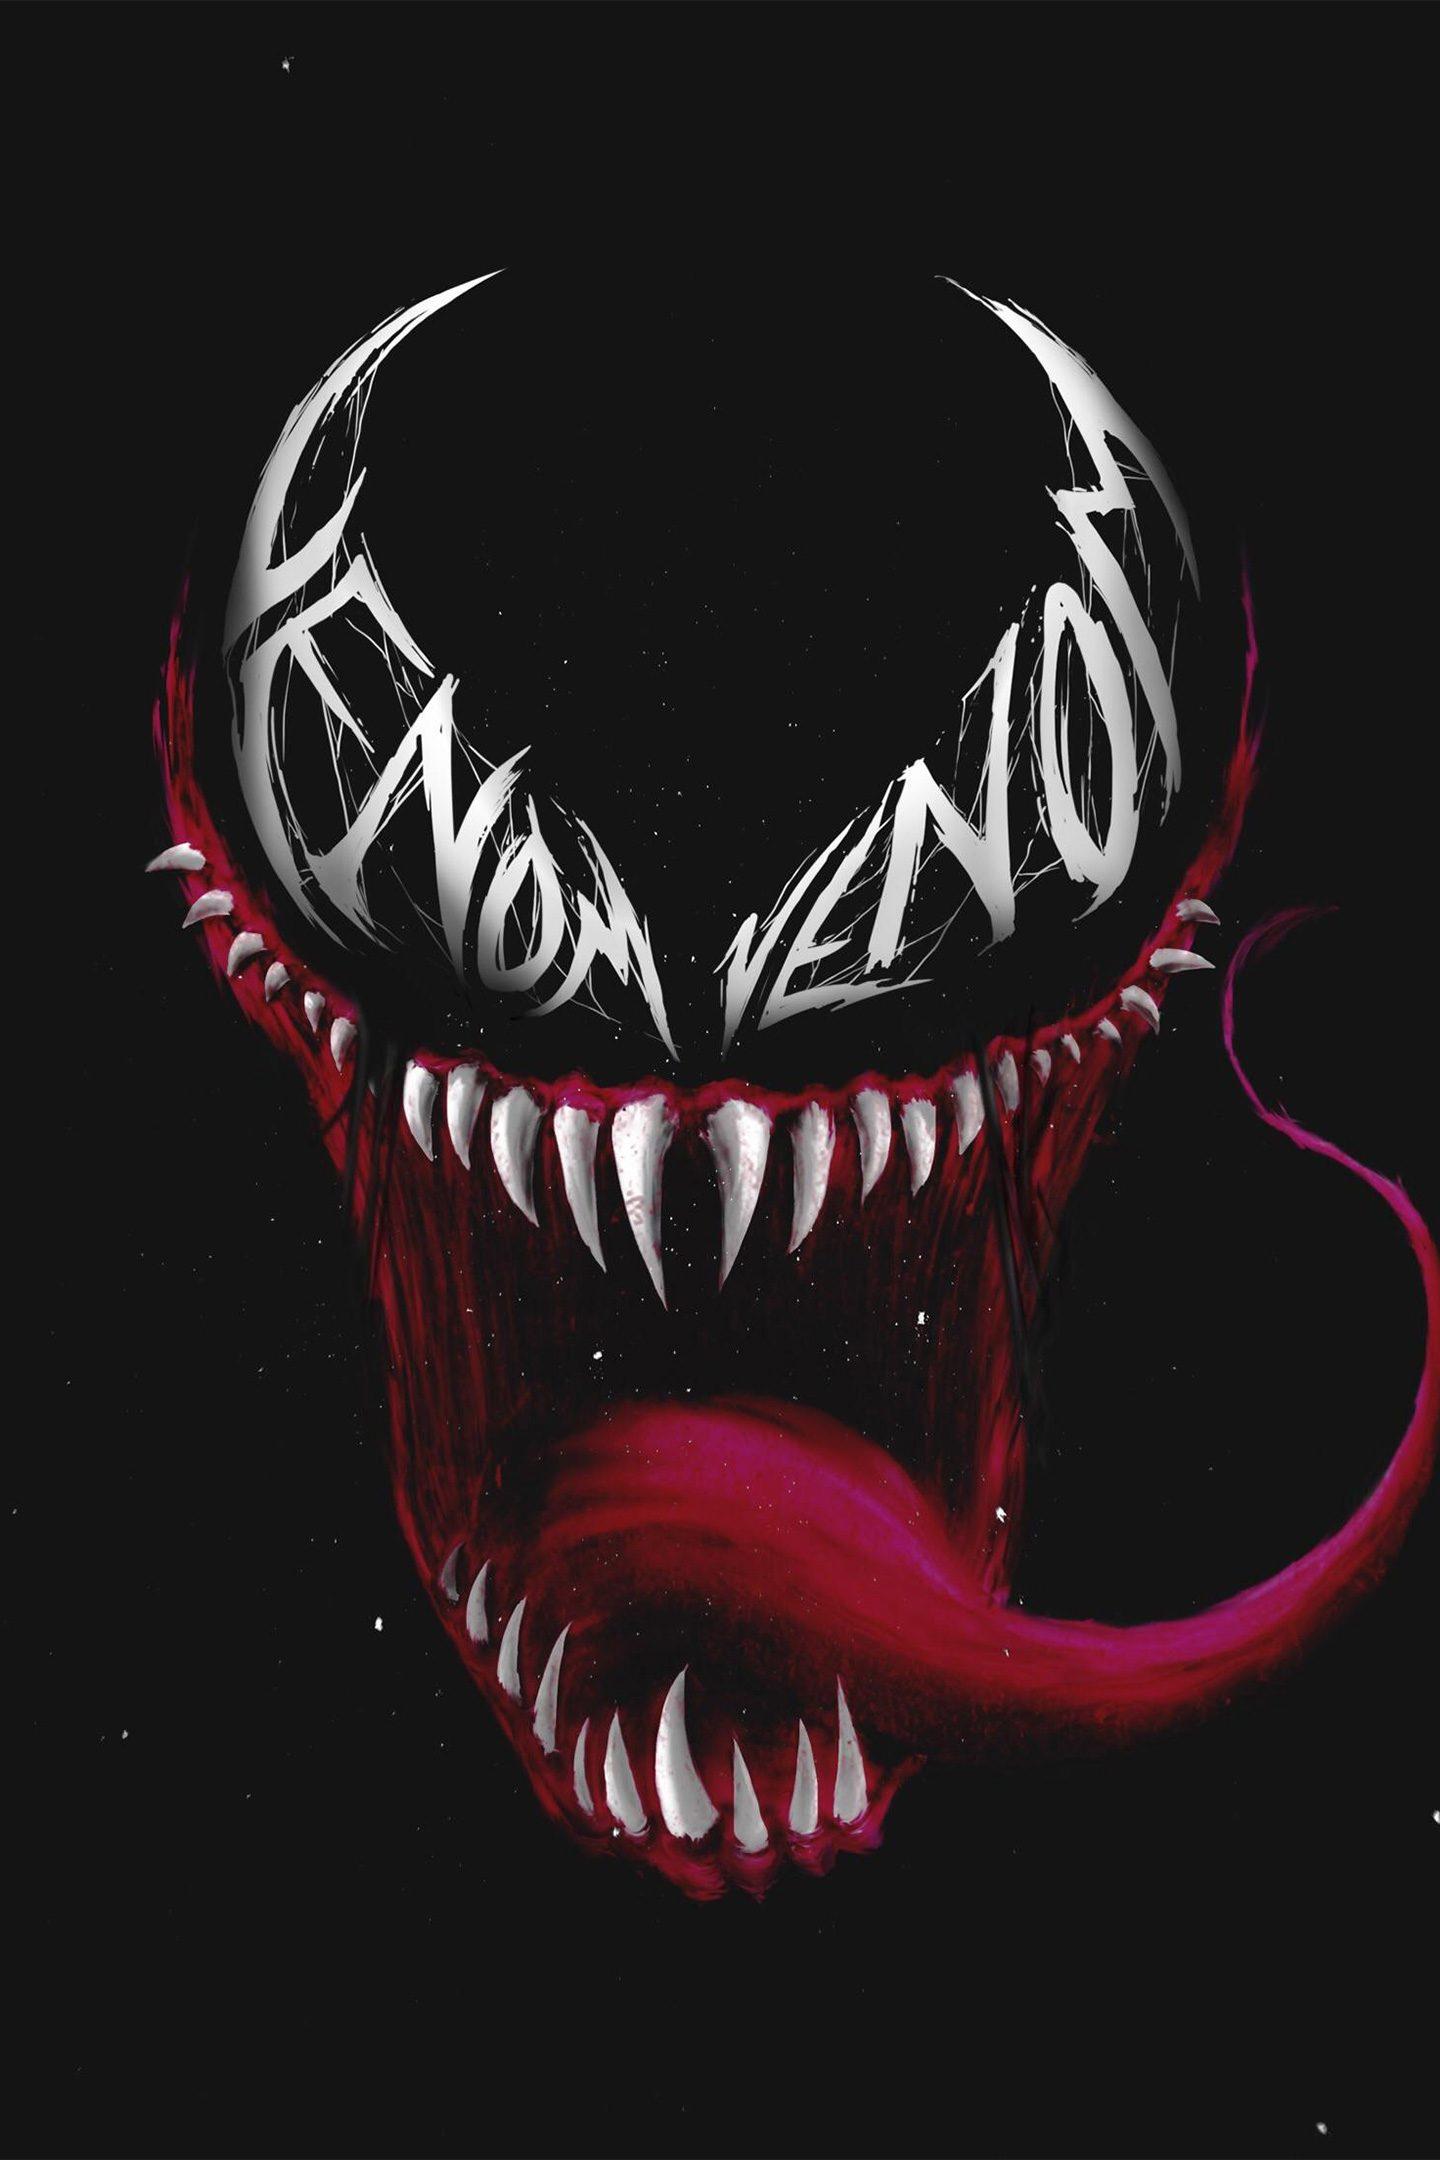 Venom Art 4k Wallpaper Best Wallpapers